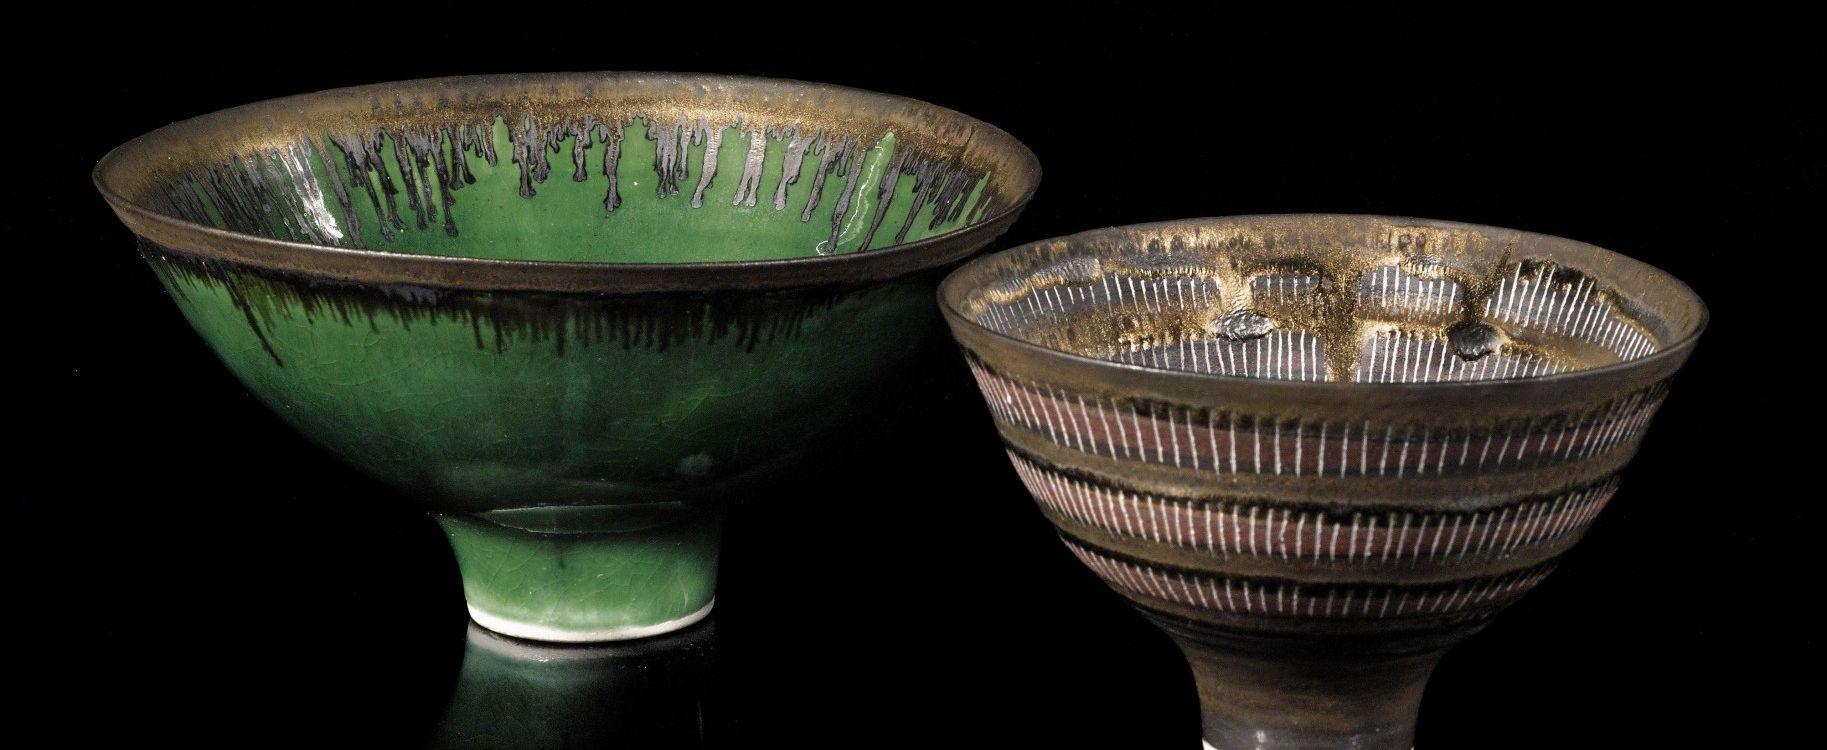 auction eye record breaking ceramics